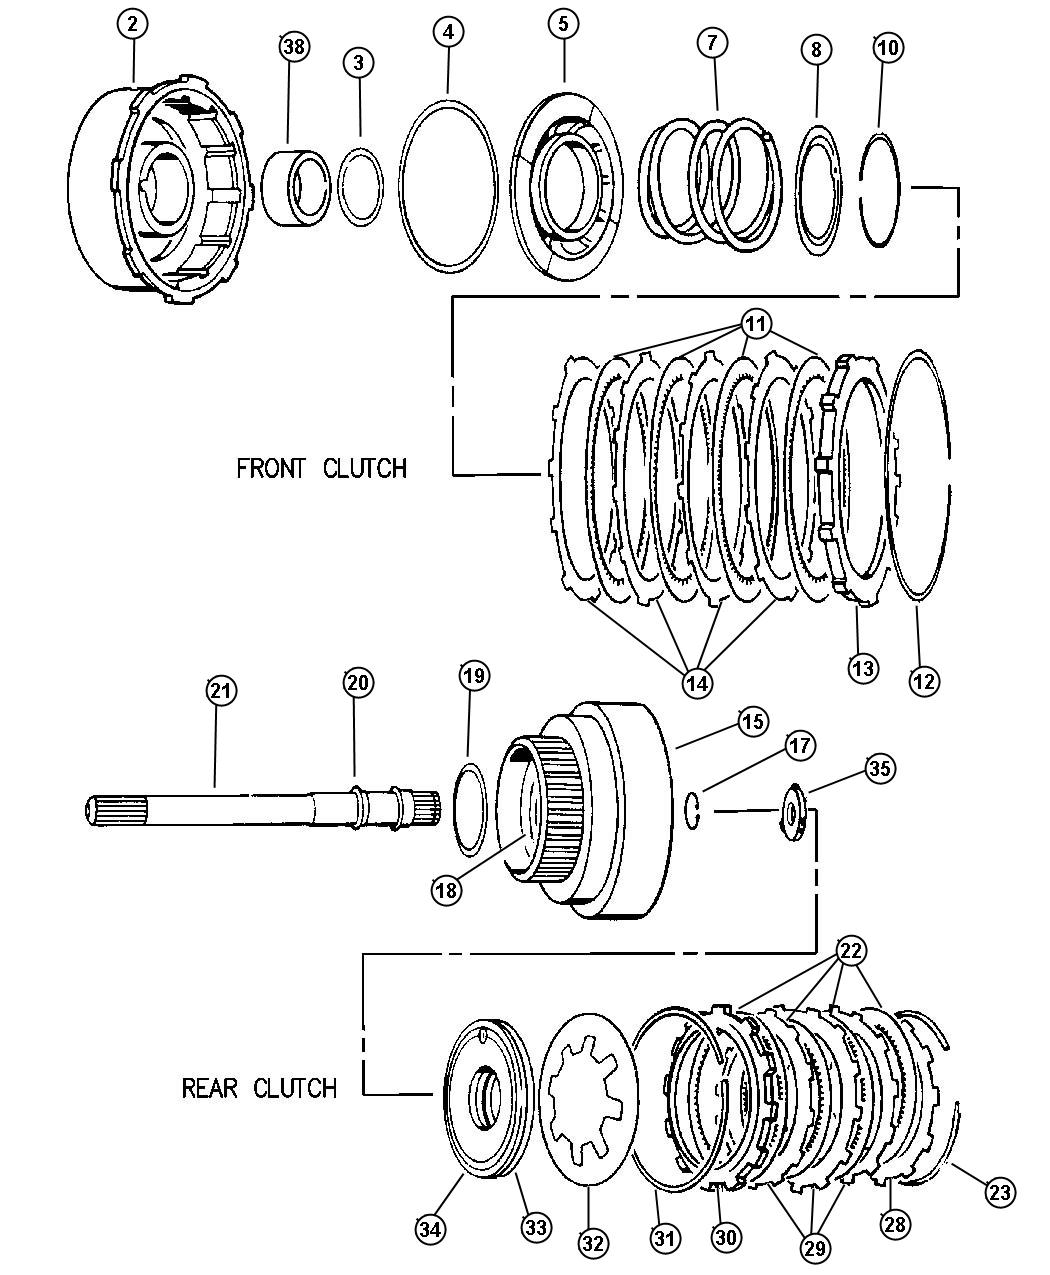 98 jeep wrangler transmission rear seal